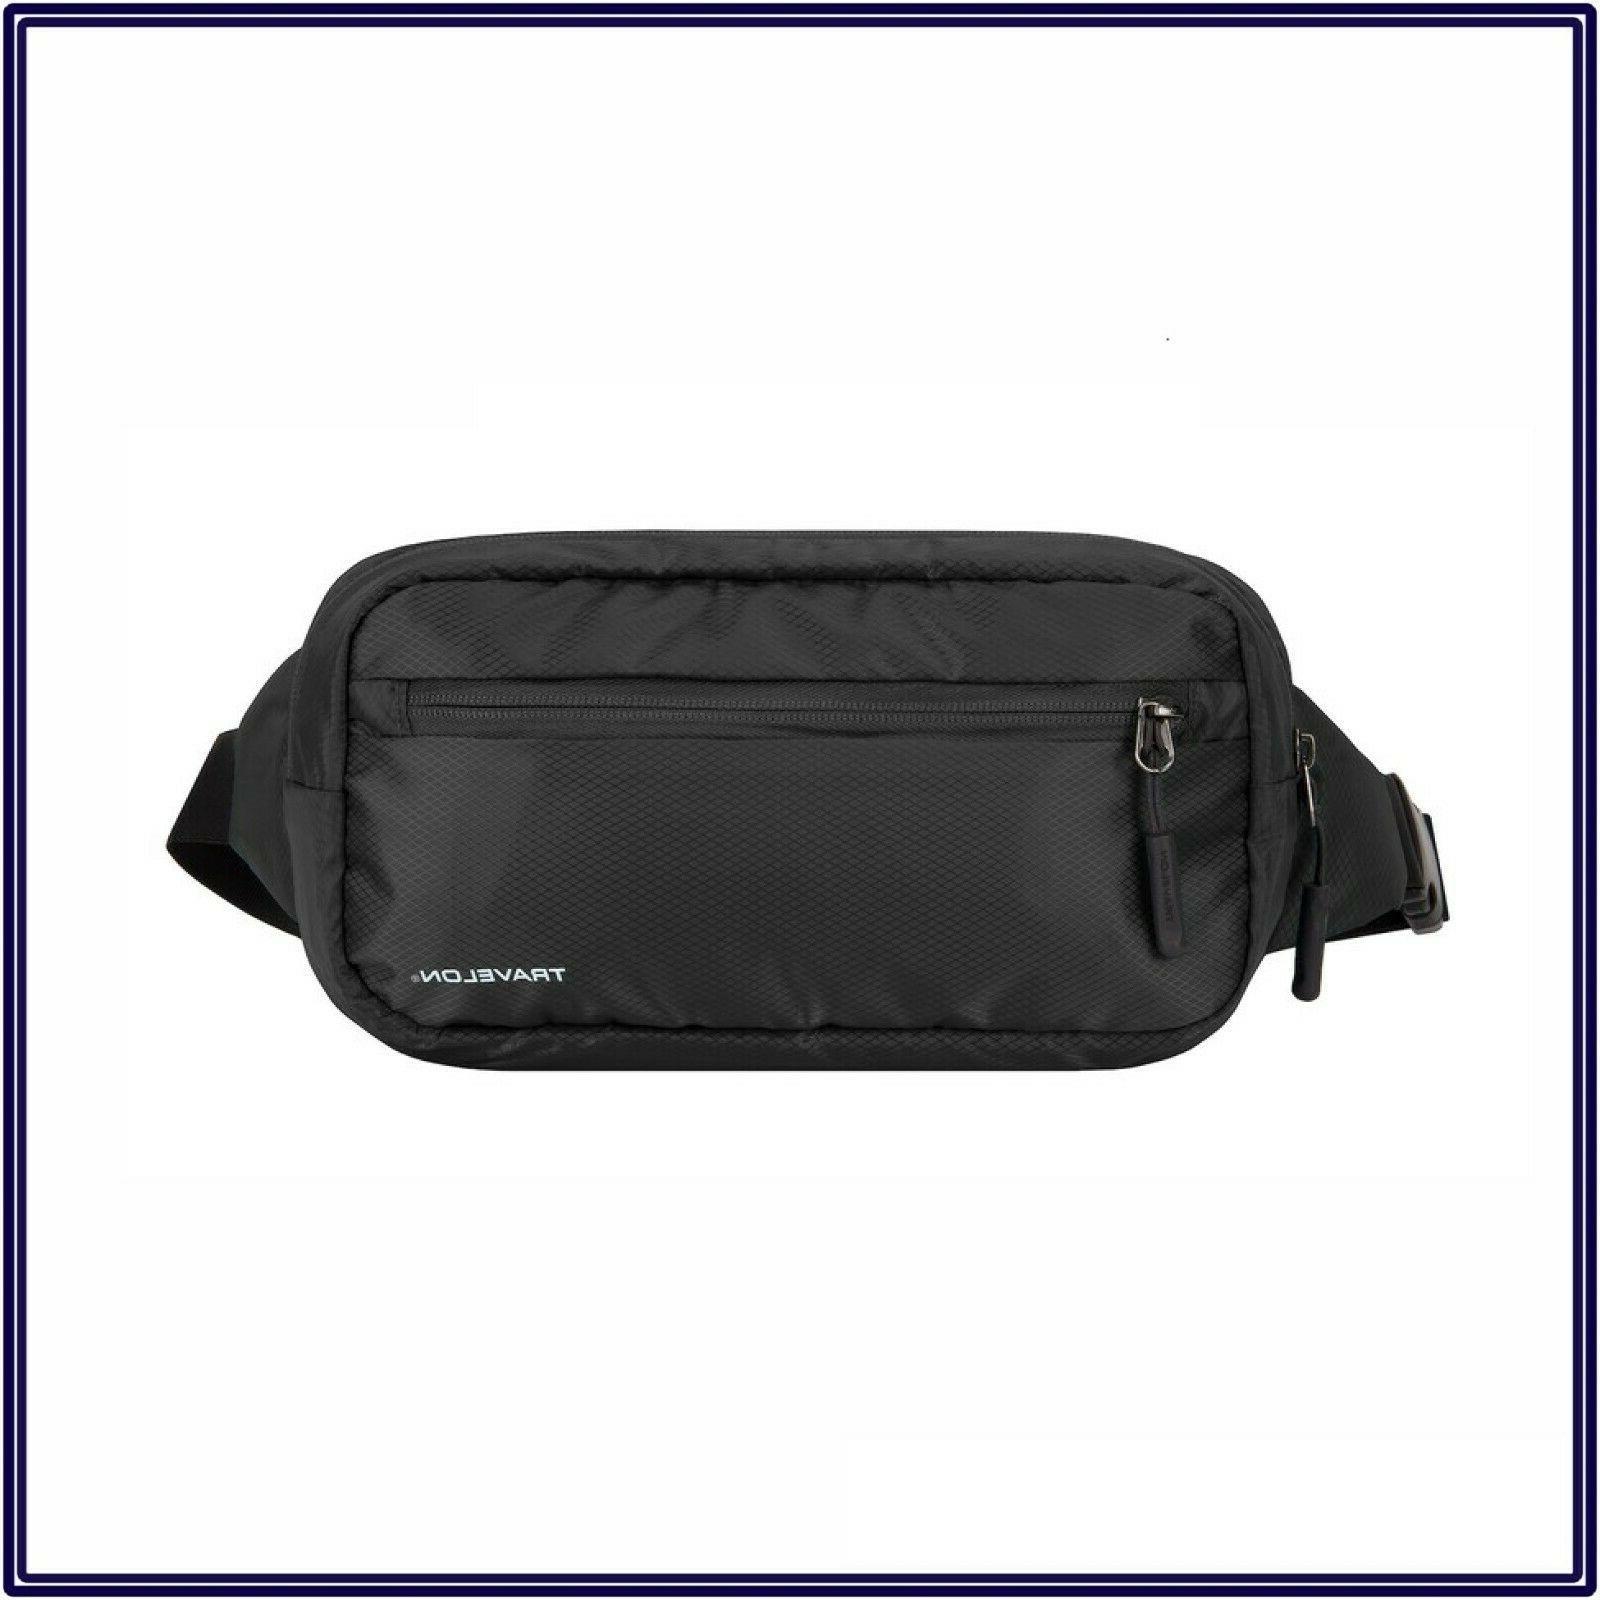 nwt rfid crossbody sling waist pack travel